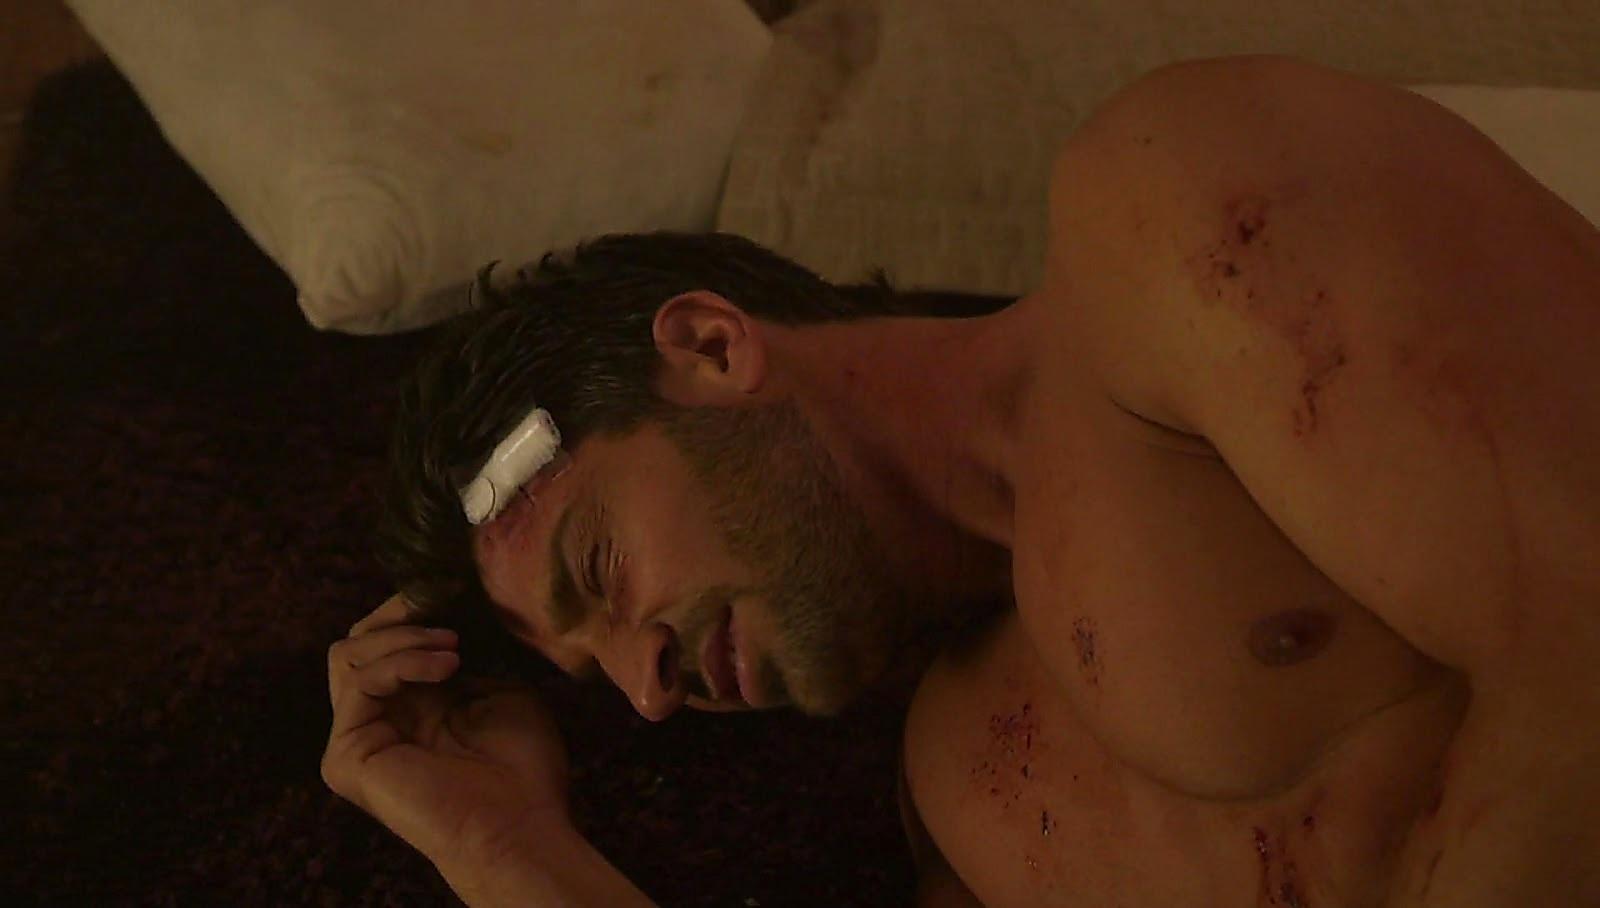 David Chocarro sexy shirtless scene April 25, 2017, 12pm